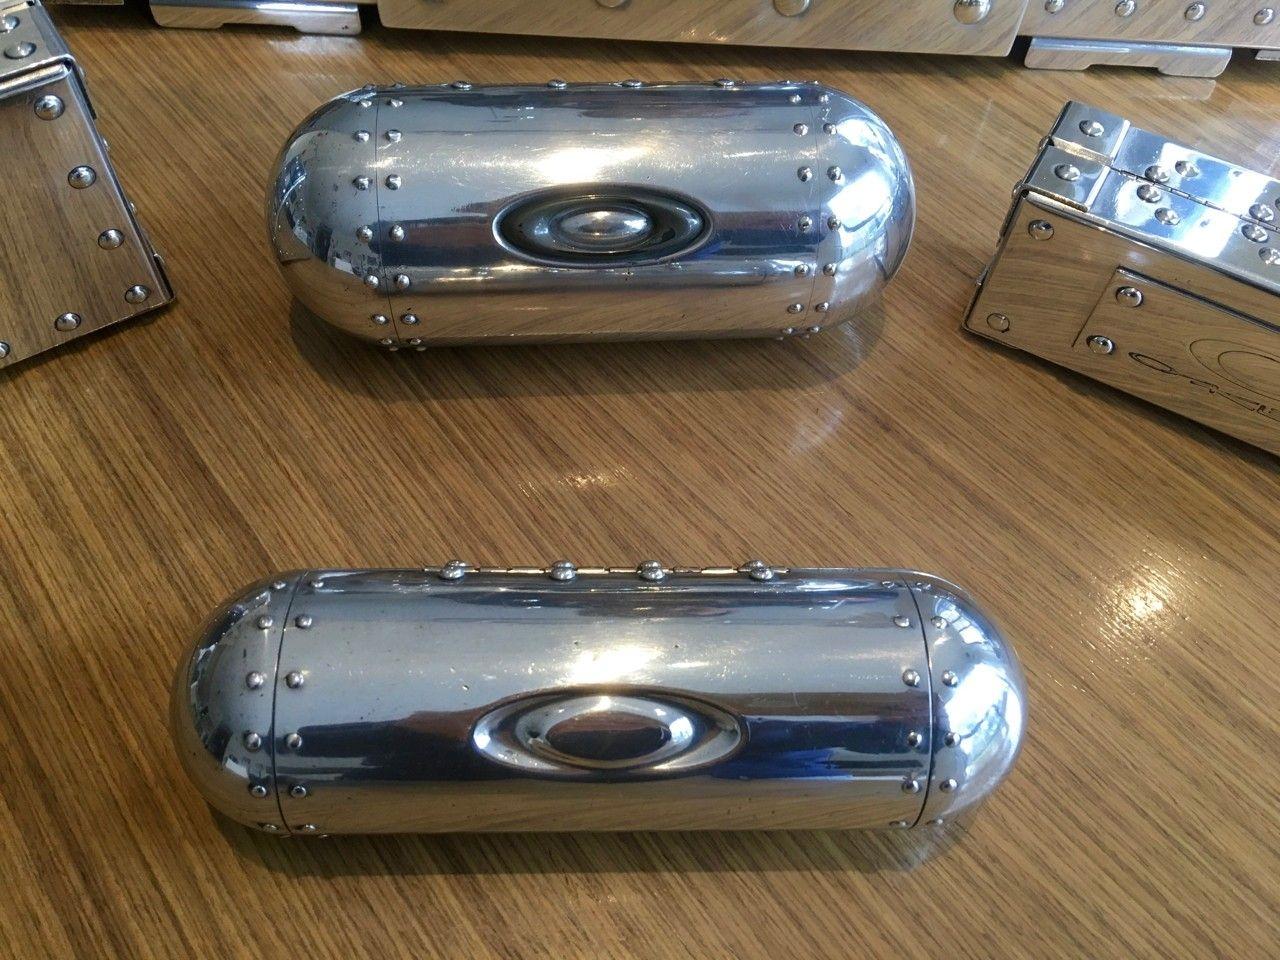 Polished Rep Briefcase & Vaults - Polished Case - 2.jpg